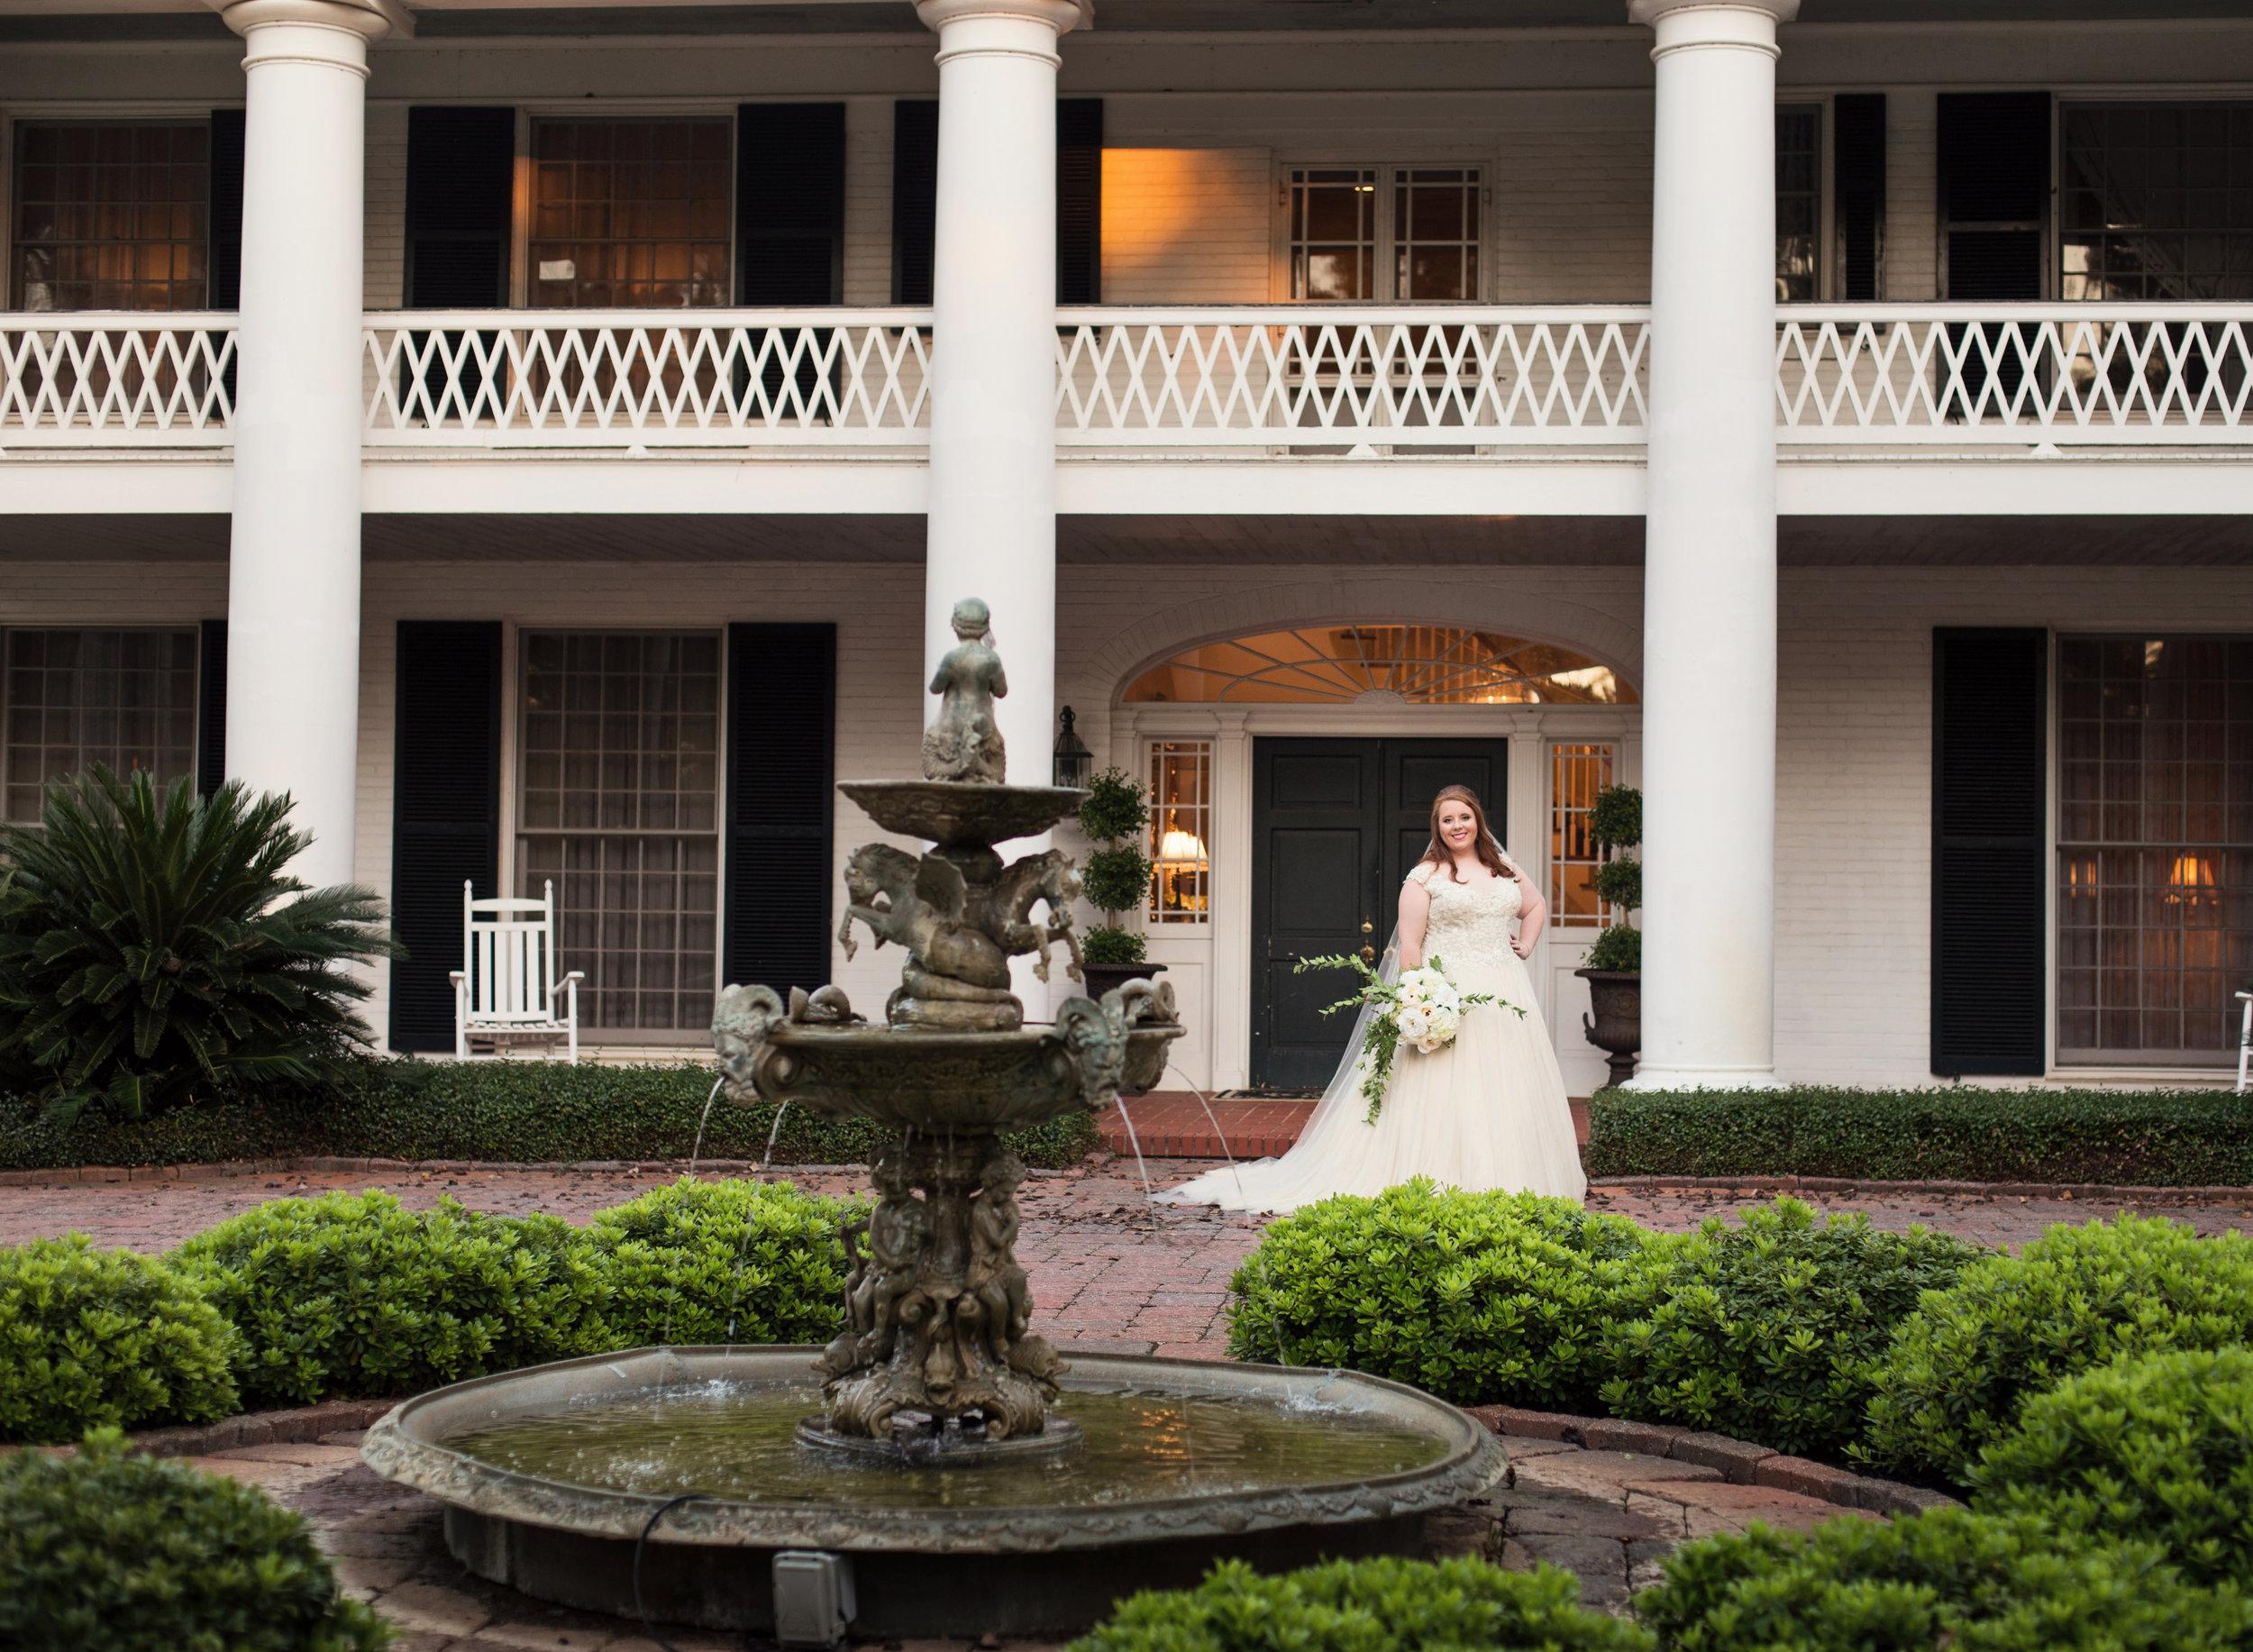 Wedding Photos at CedarCroft Plantation in Greenwood, Louisiana